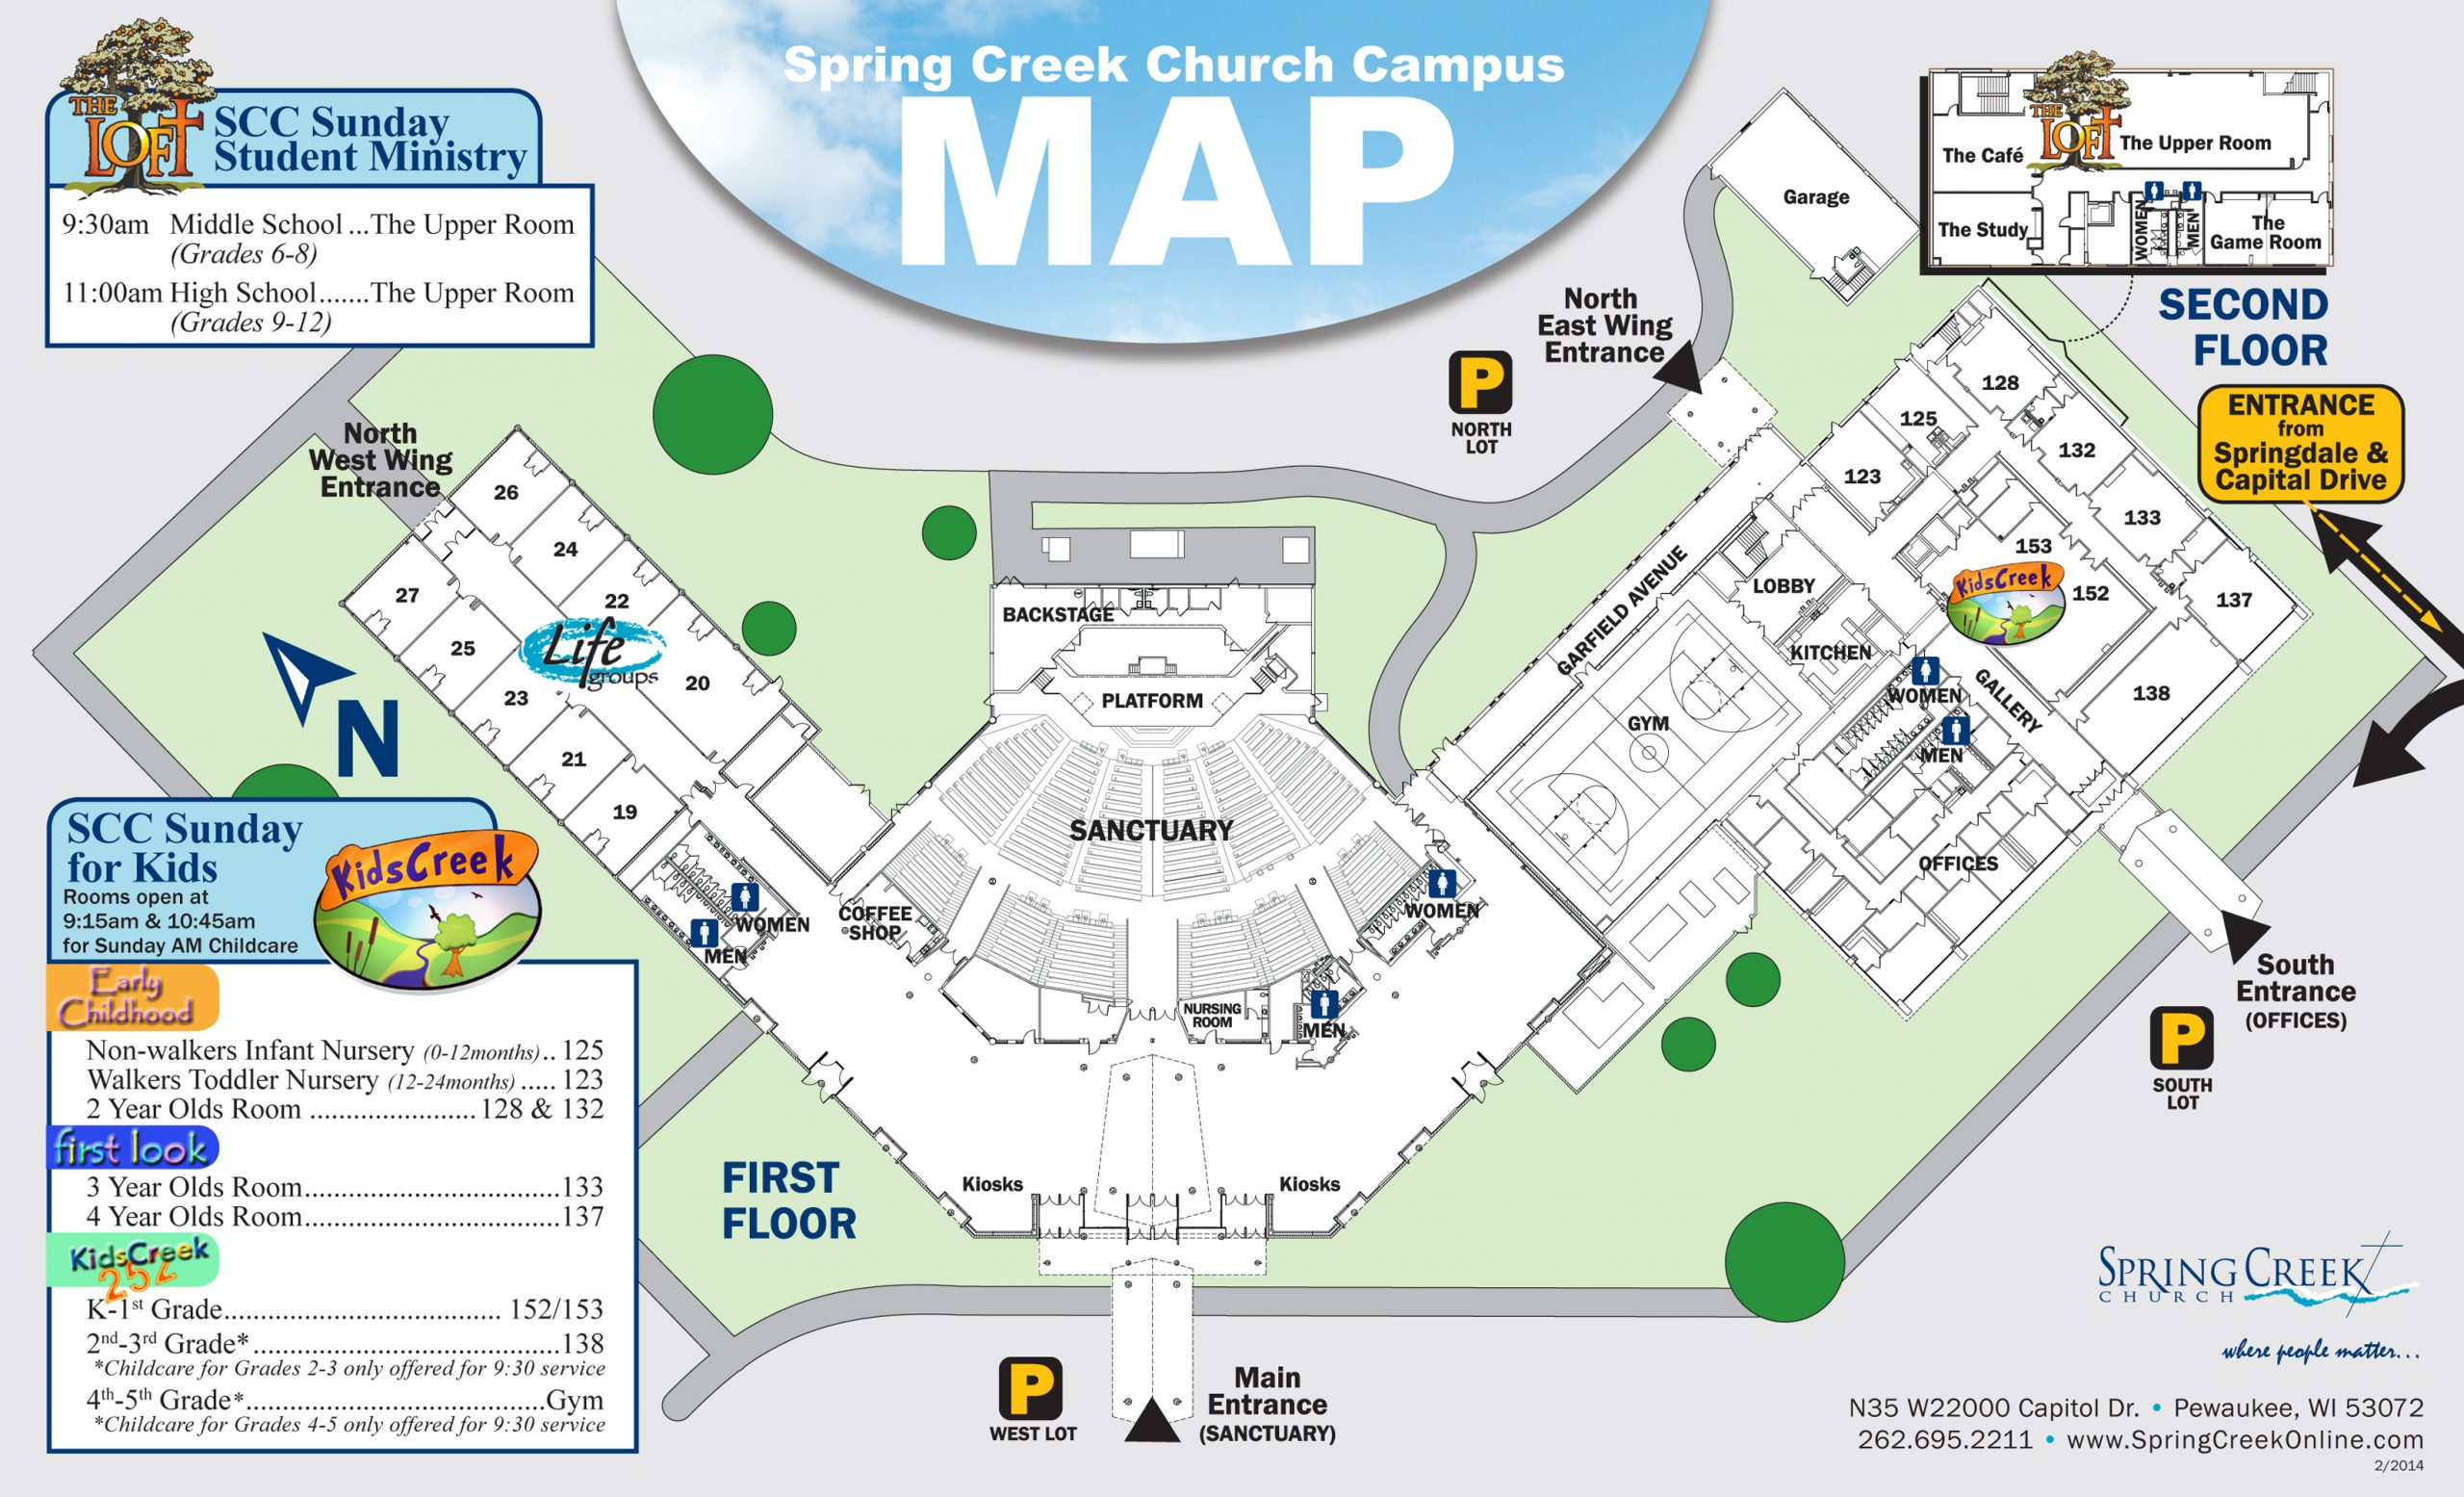 Spring Creek Church - Campus Map For Collin College School Calendar